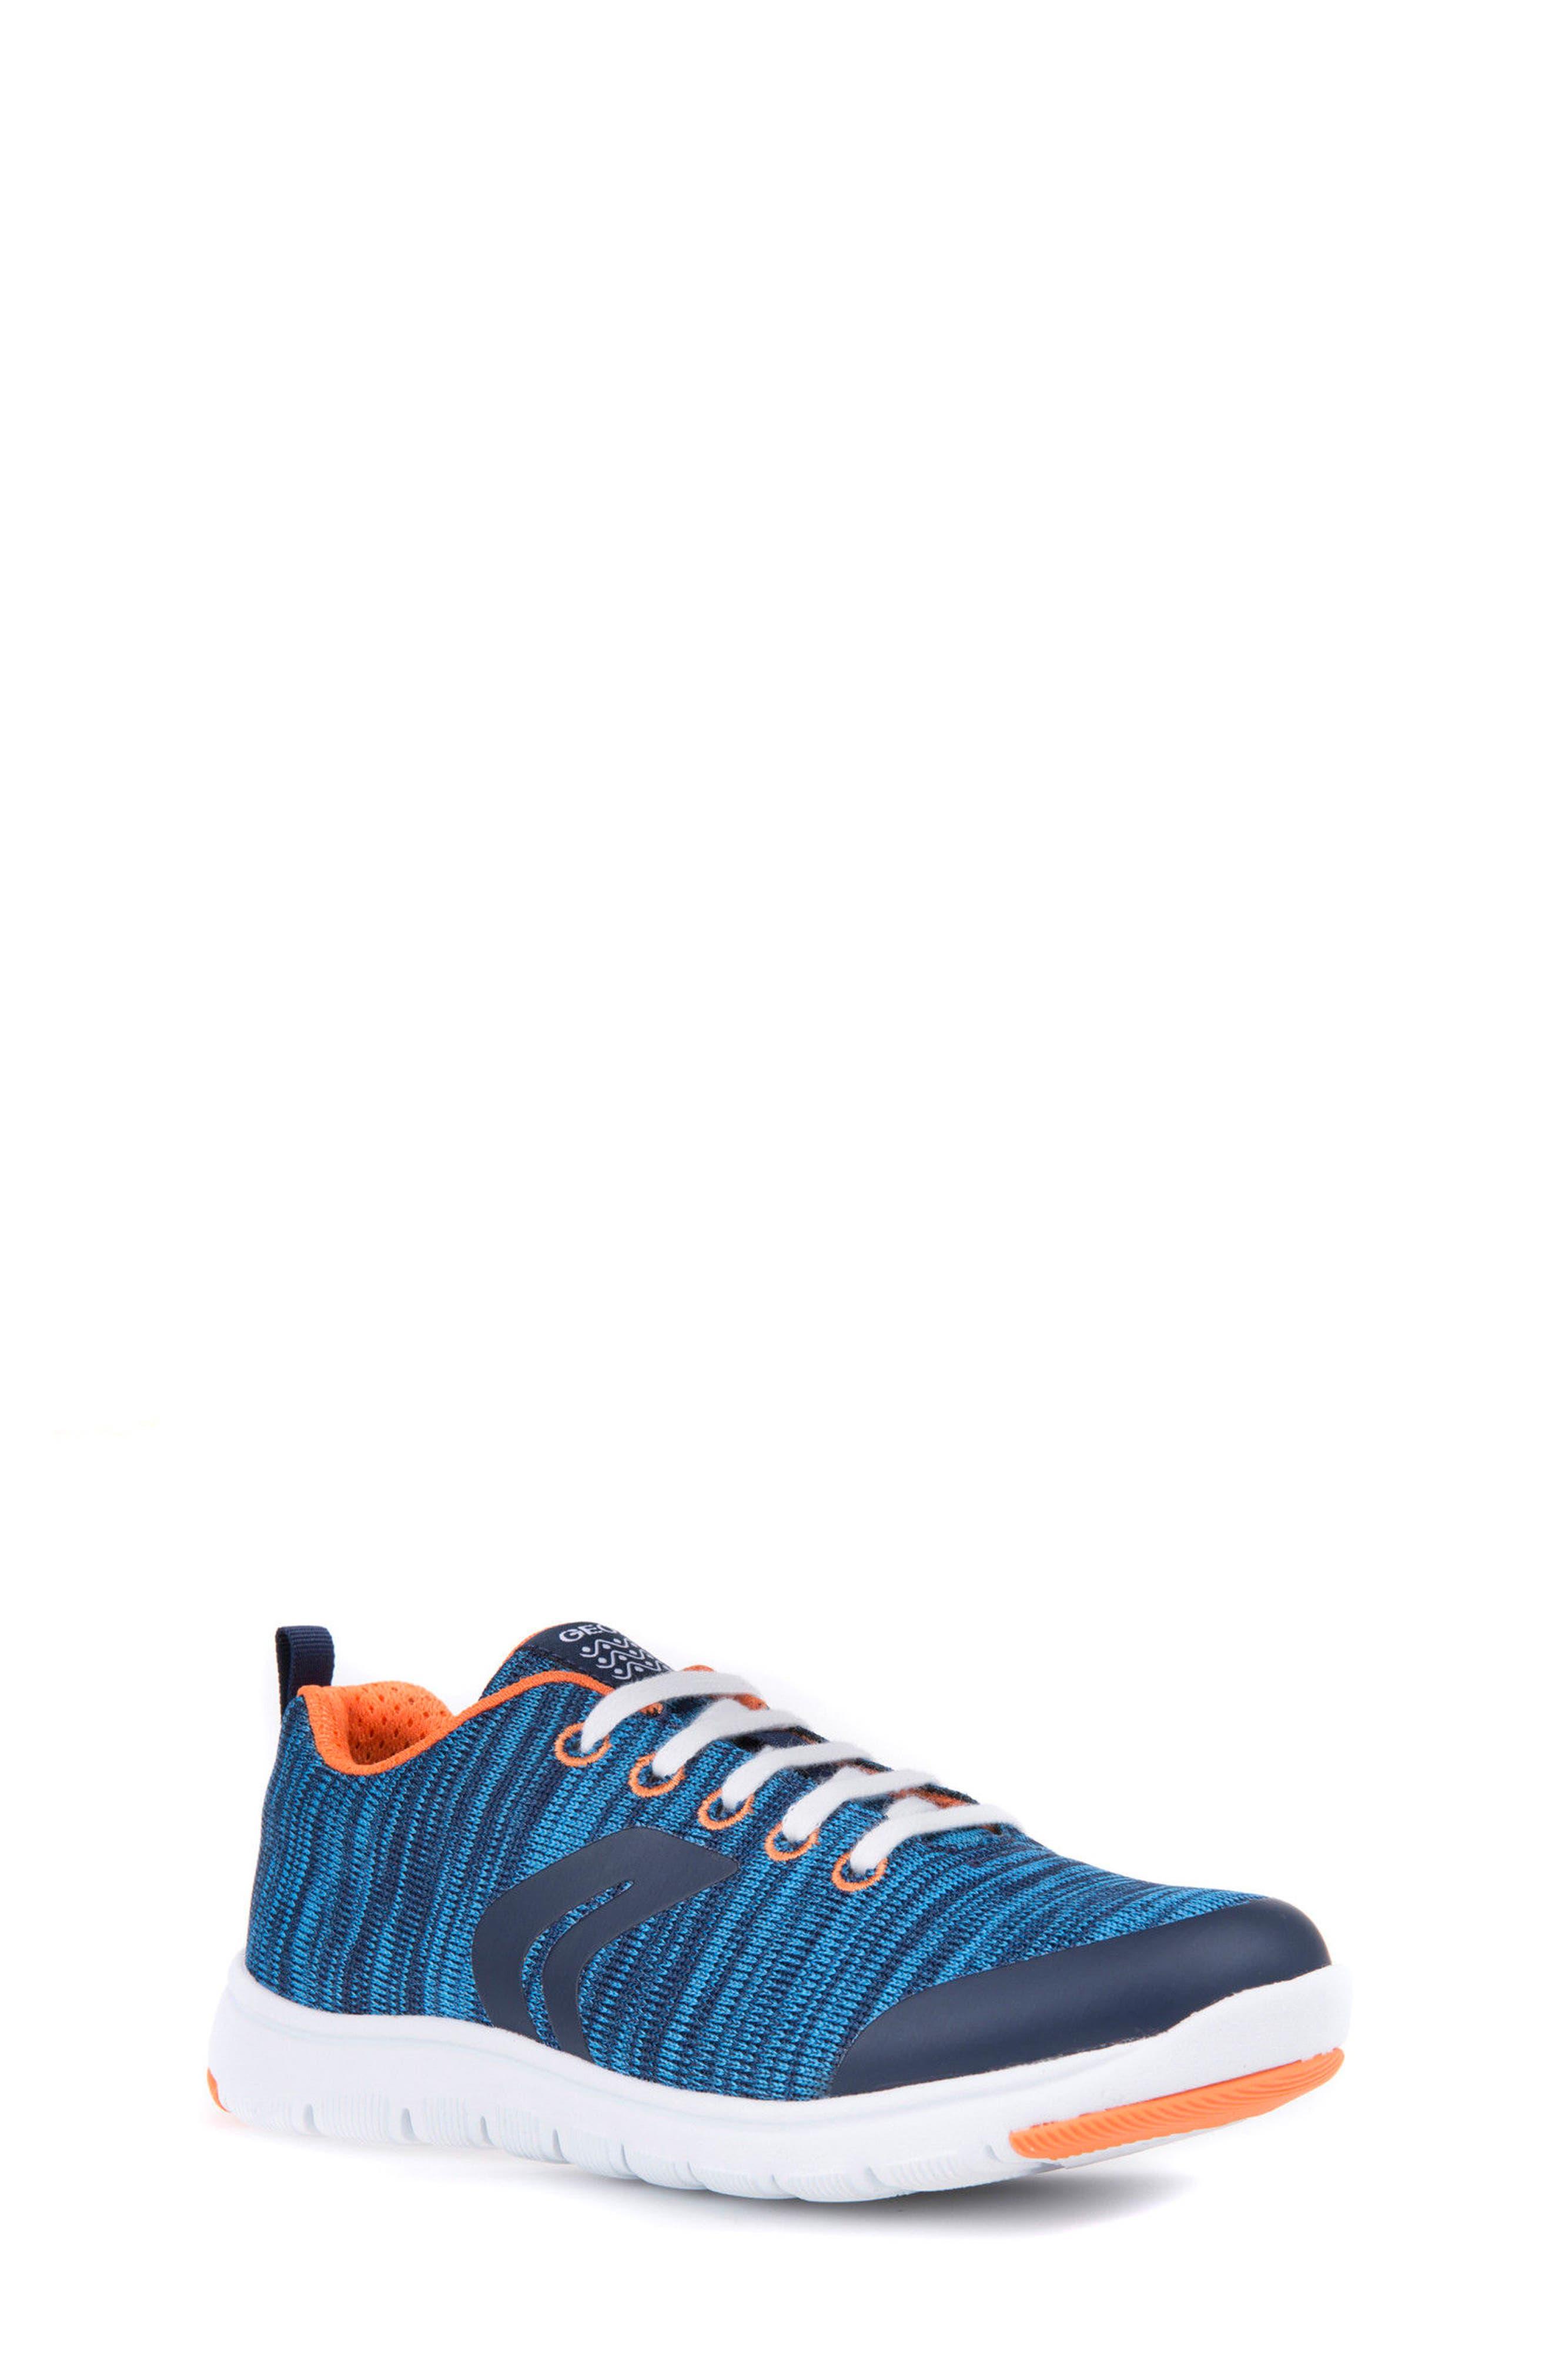 Geox Xunday Performance Knit Low Top Sneaker (Toddler, Little Kid & Big Kid)